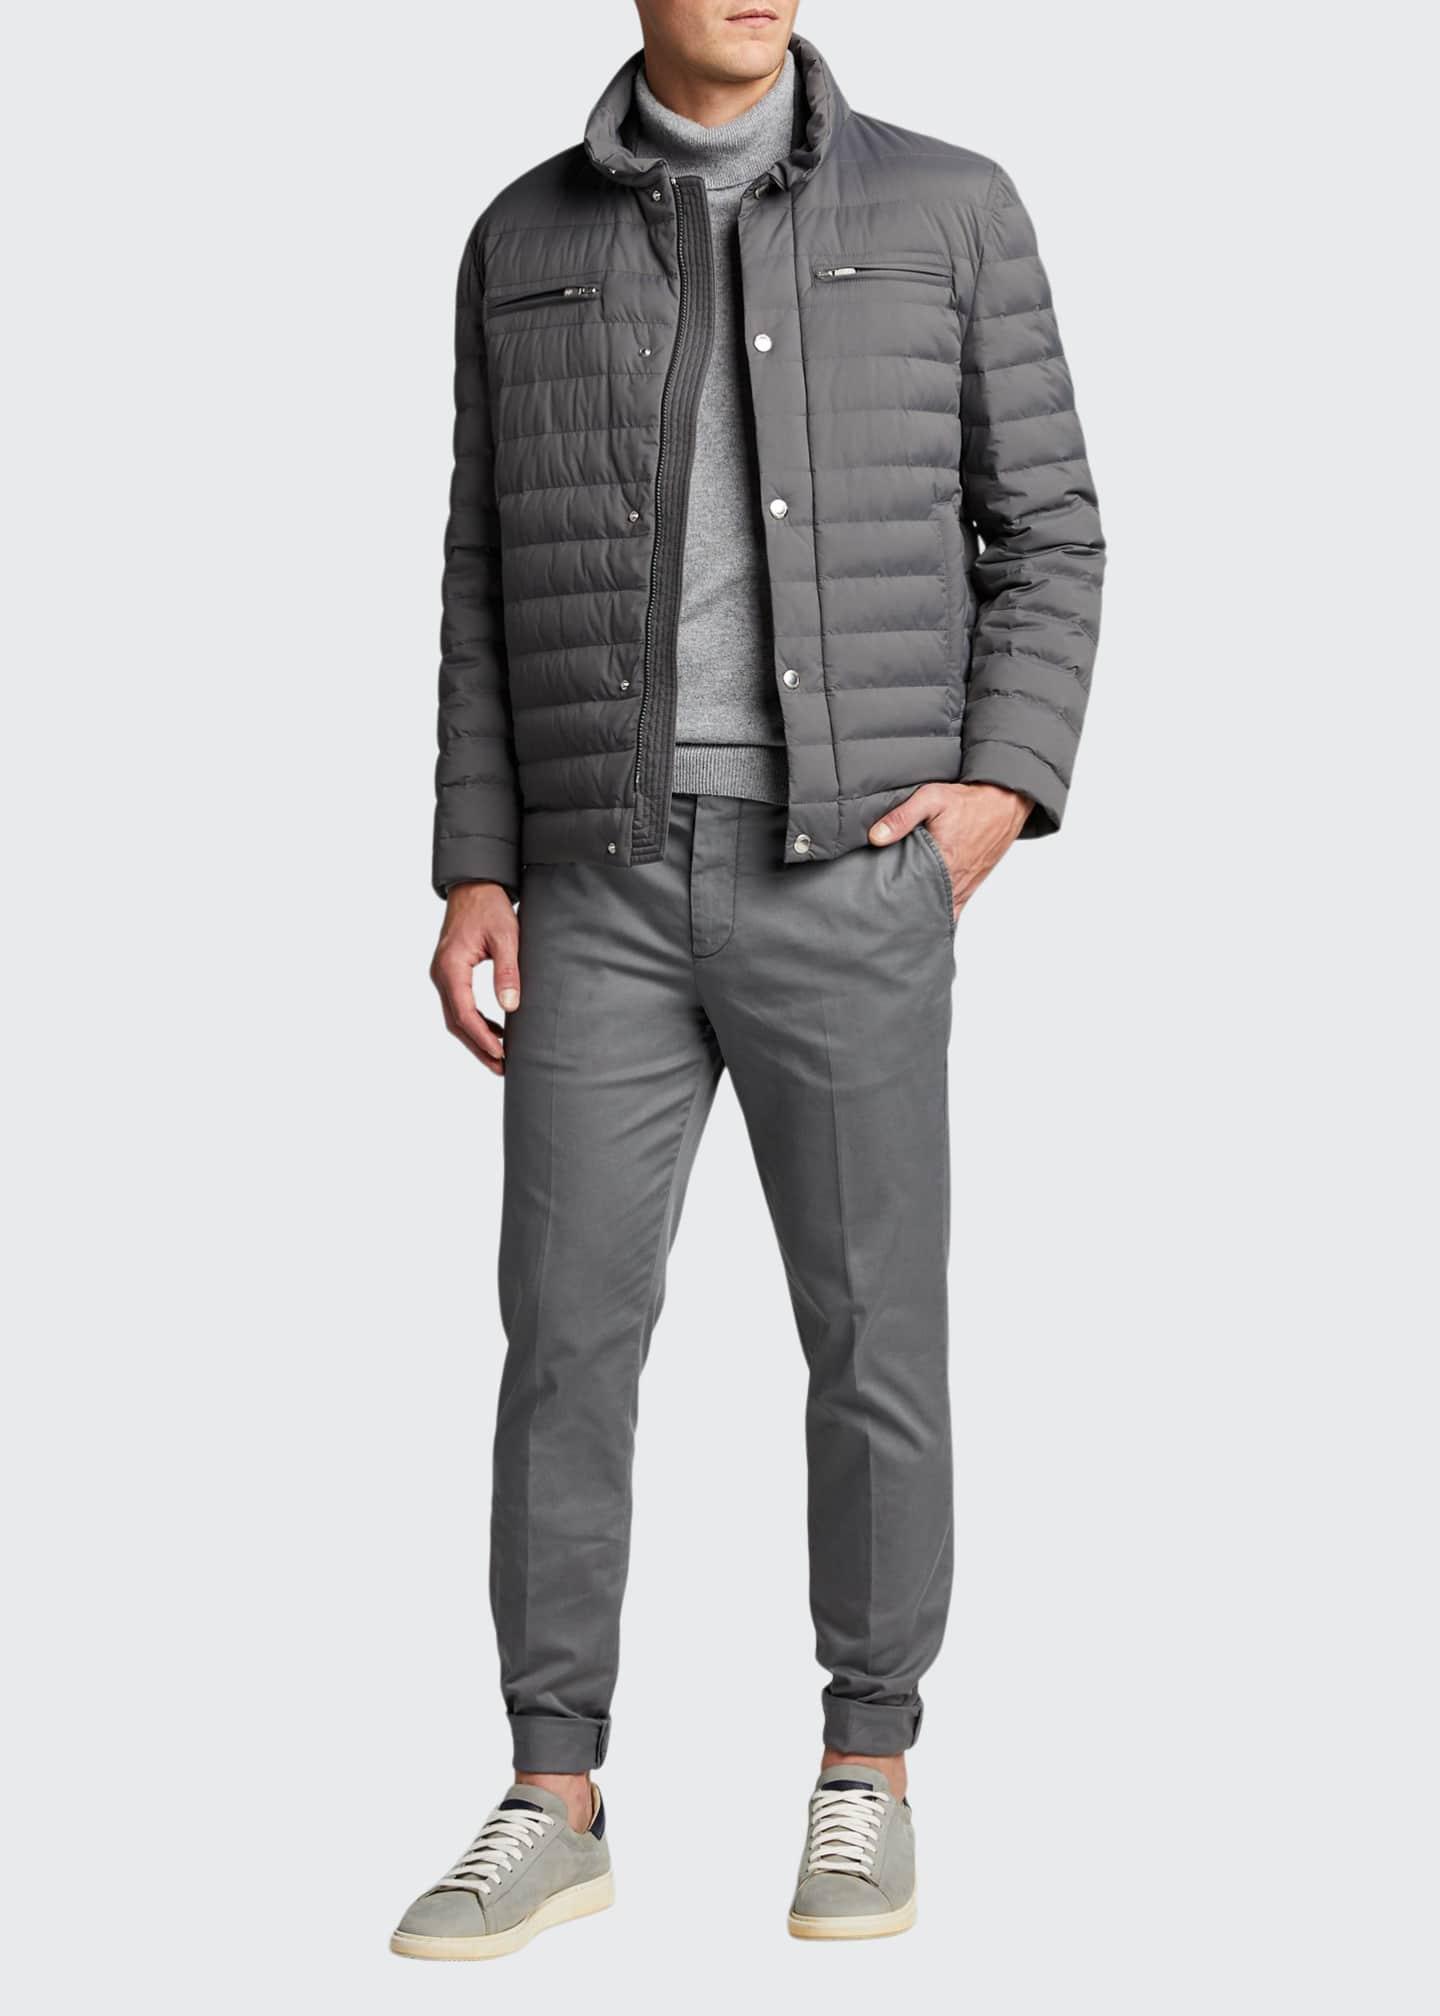 Brunello Cucinelli Men's Lightweight Water-Resistant Down Jacket